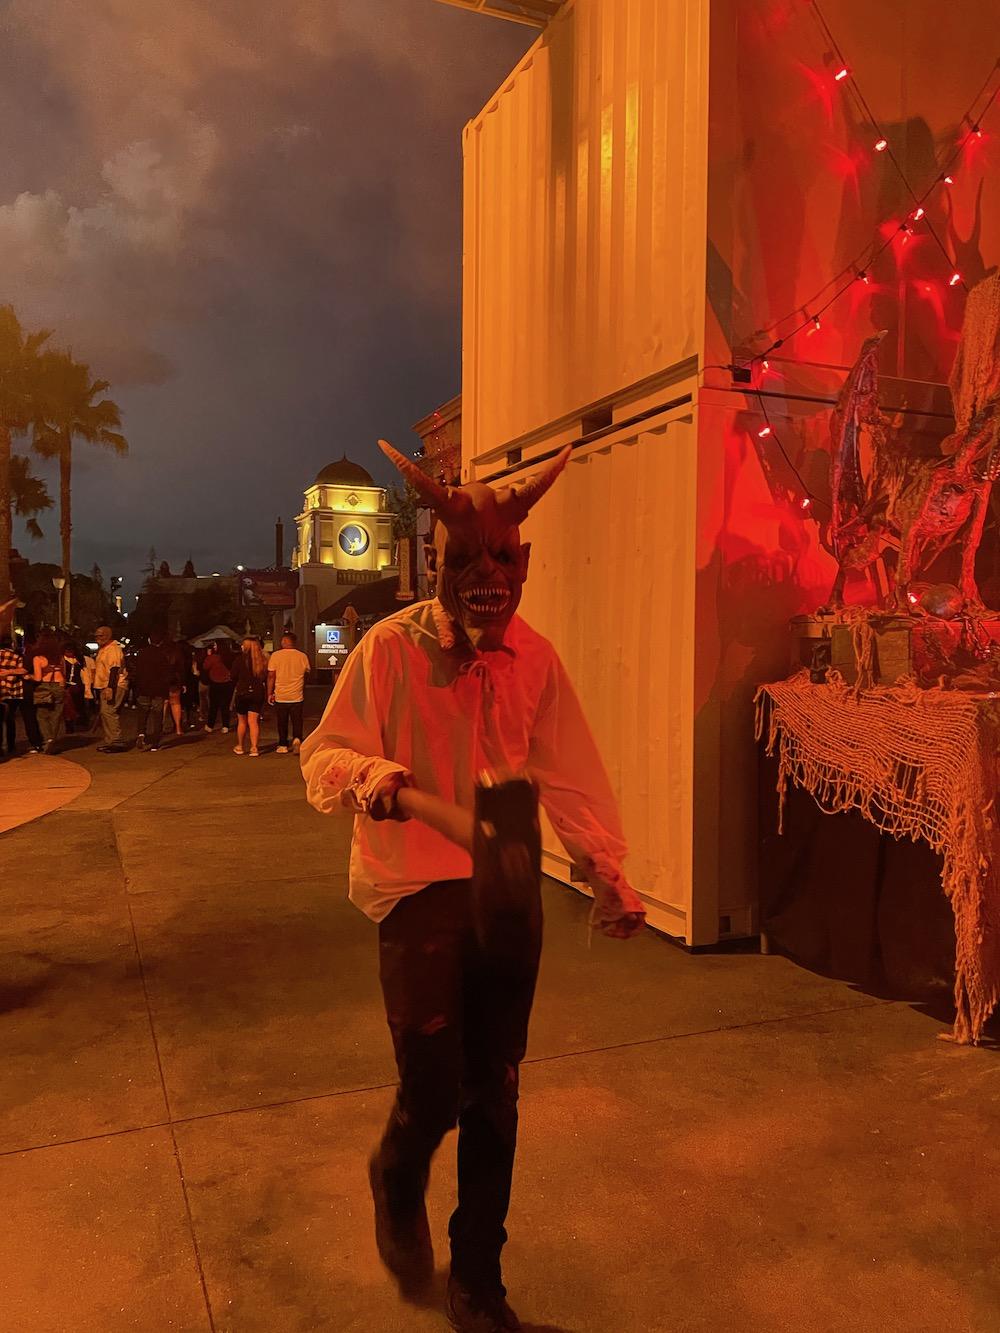 Halloween Horror Nights 2021 at Universal Studios Hollywood